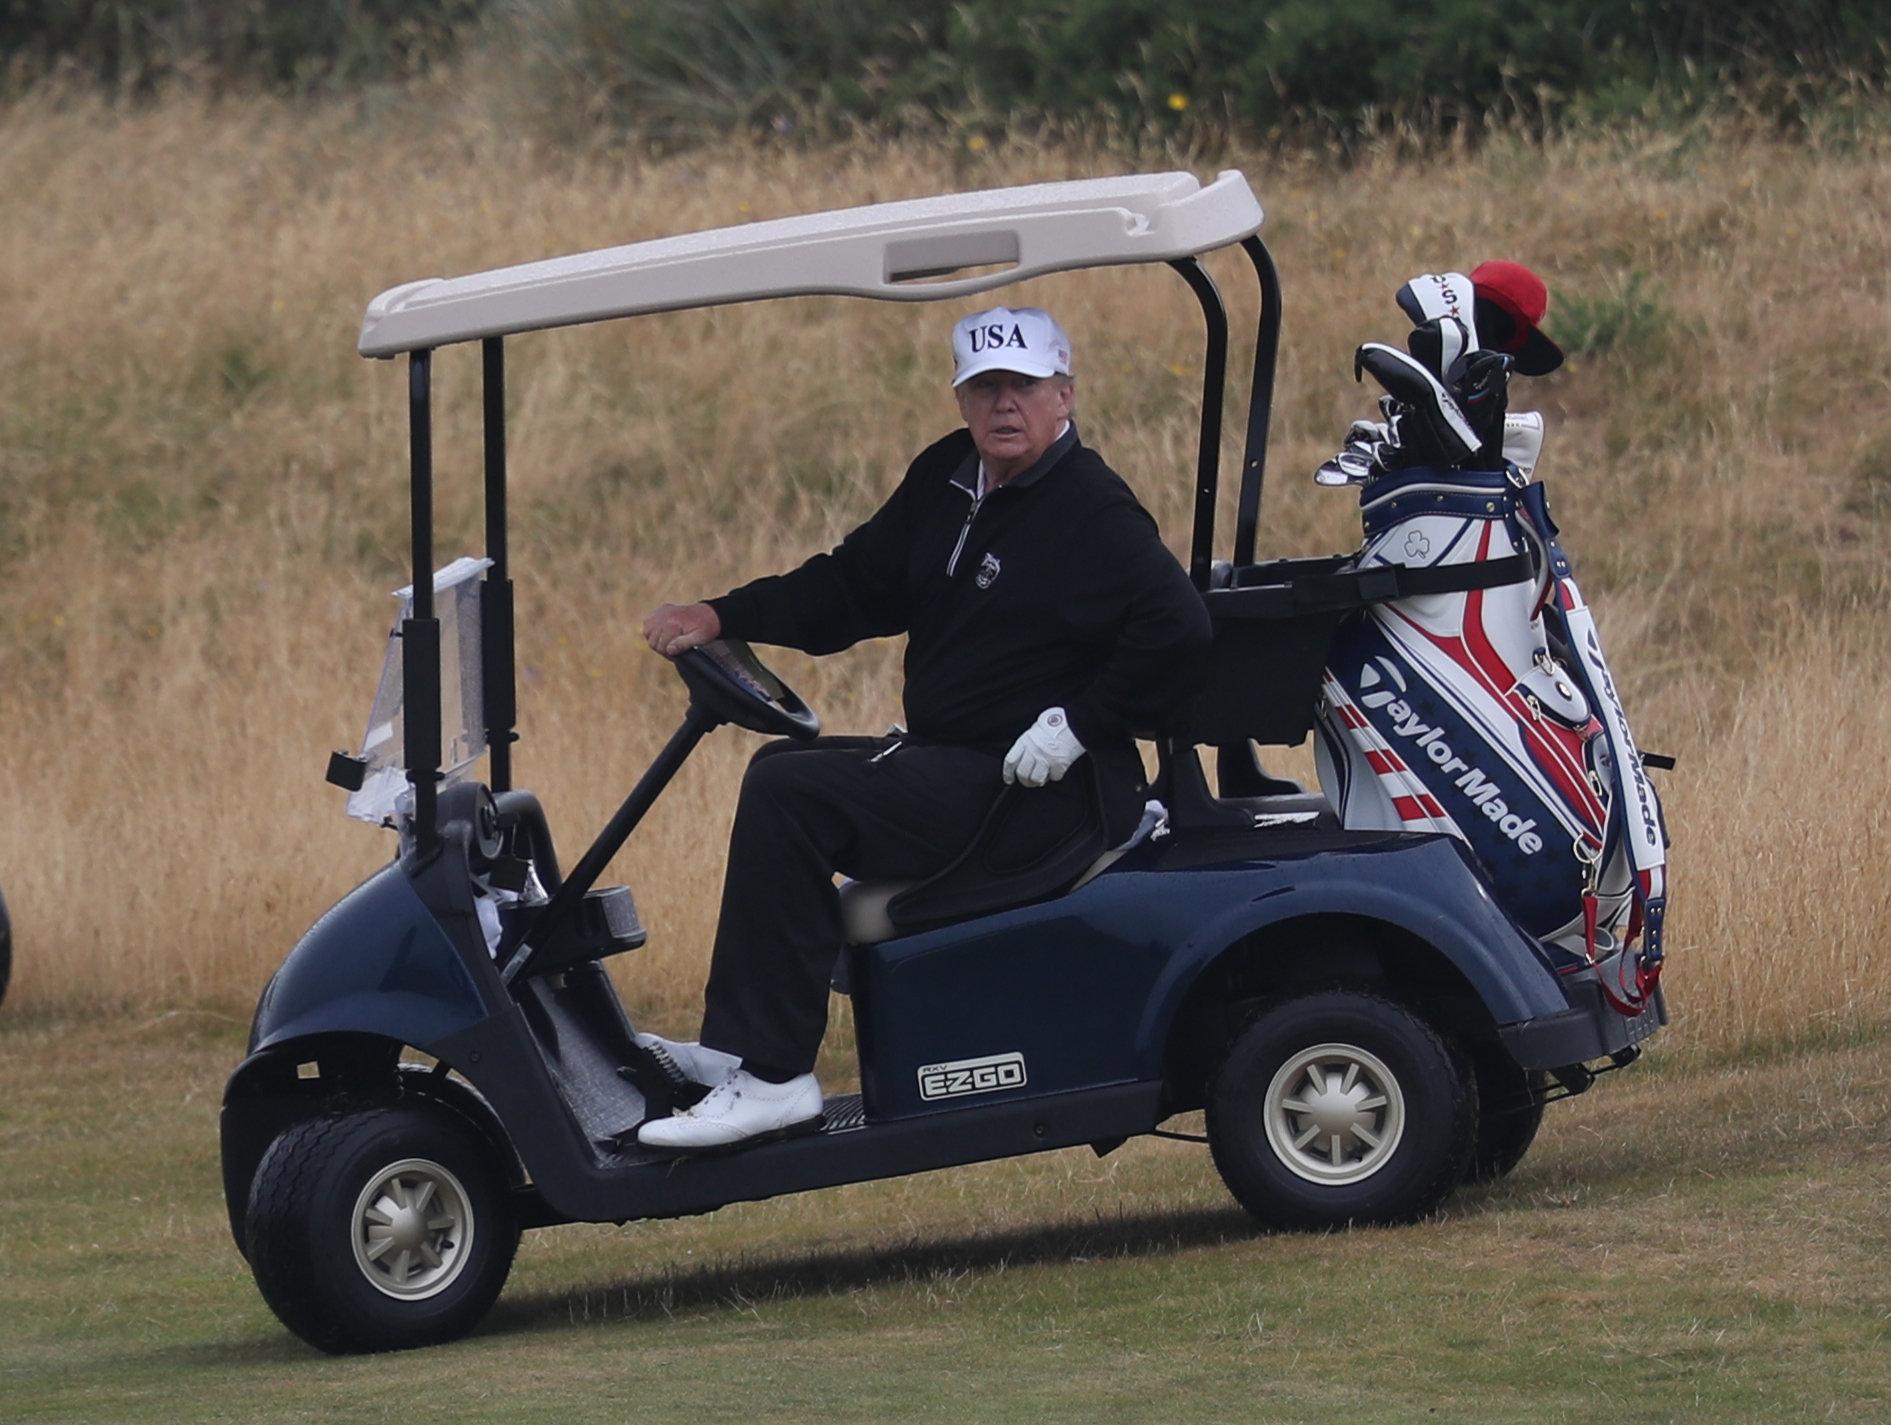 Donald Trump Claims He Won A Golf Tournament He Didn't Even